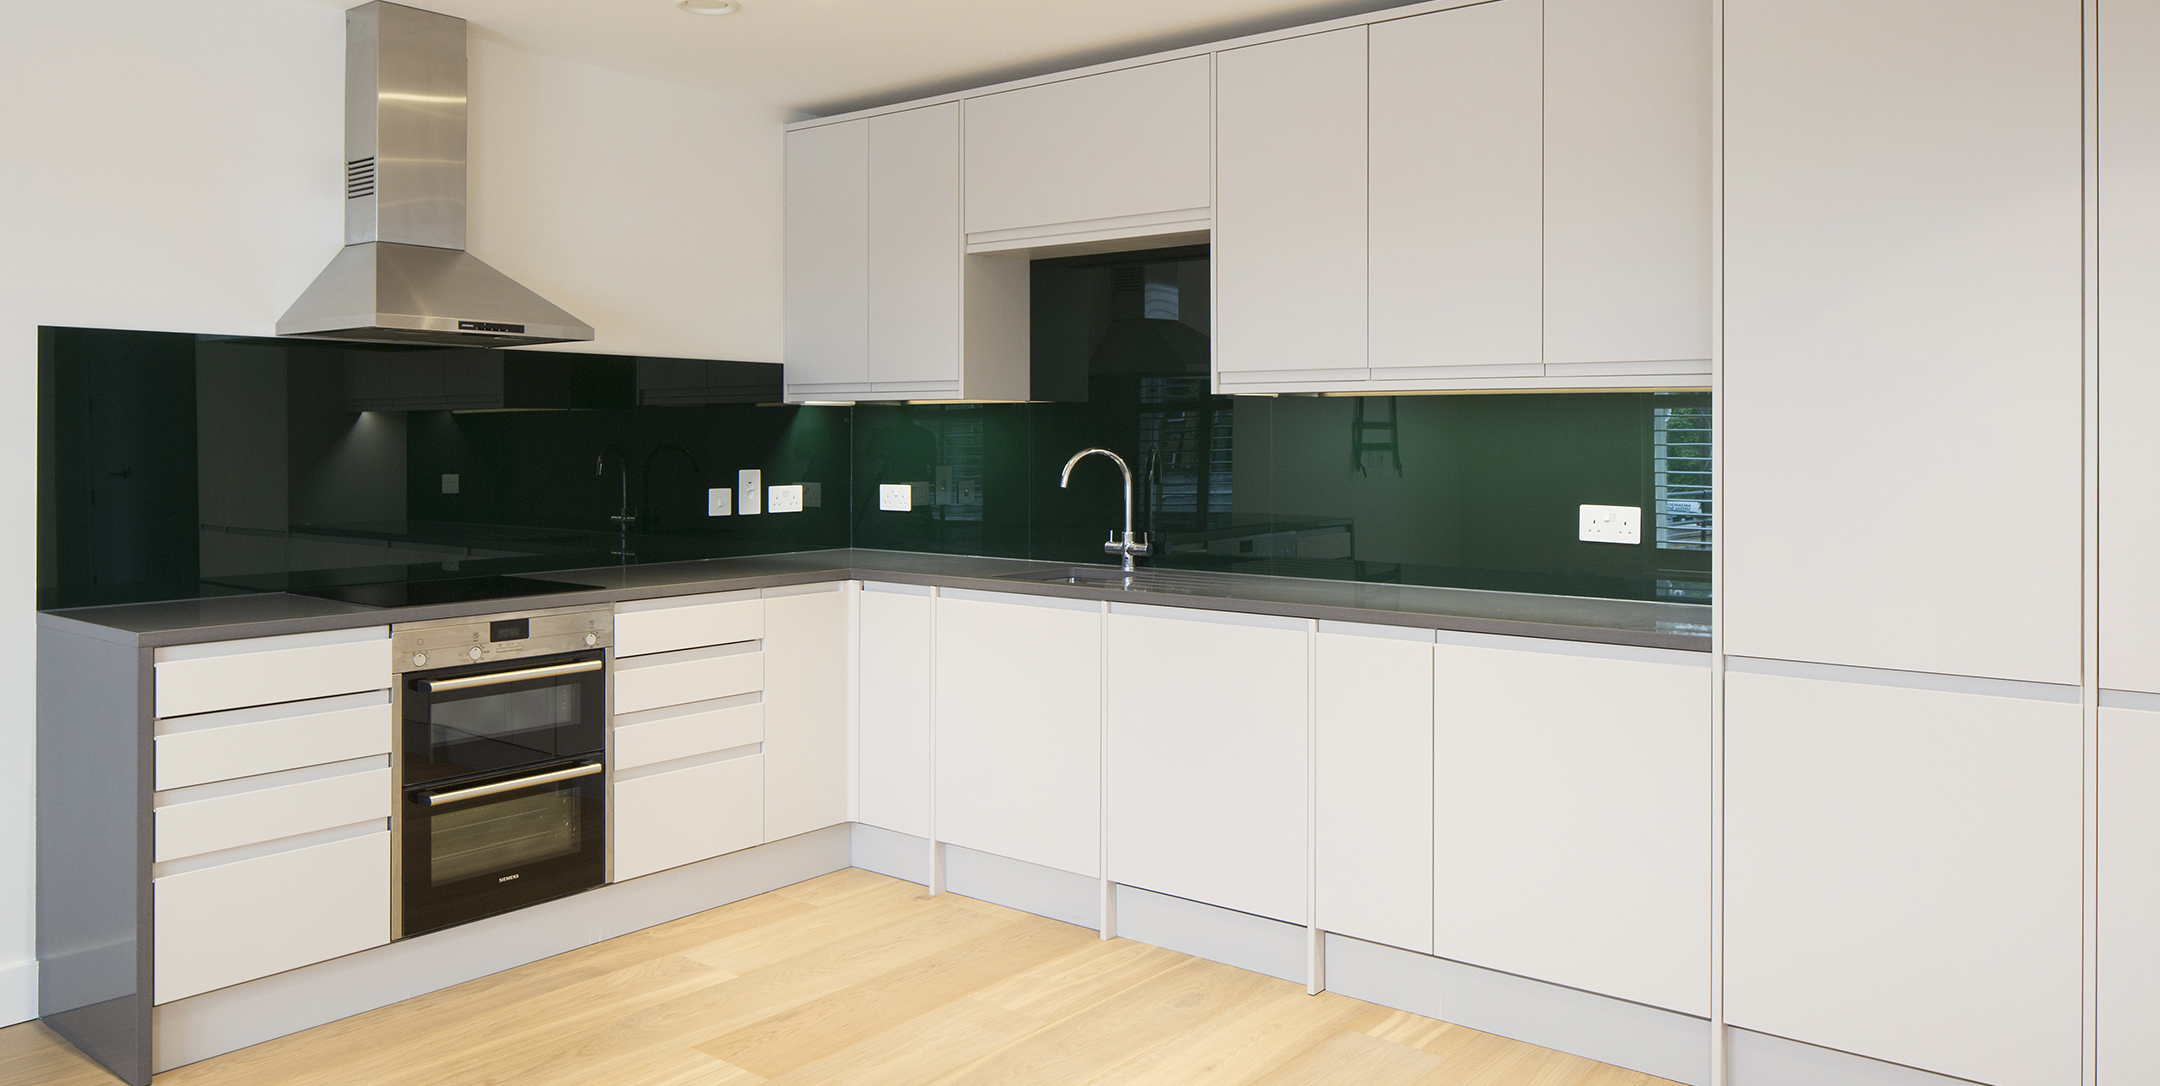 Home Refurbishments Surrey - Ashville Inc